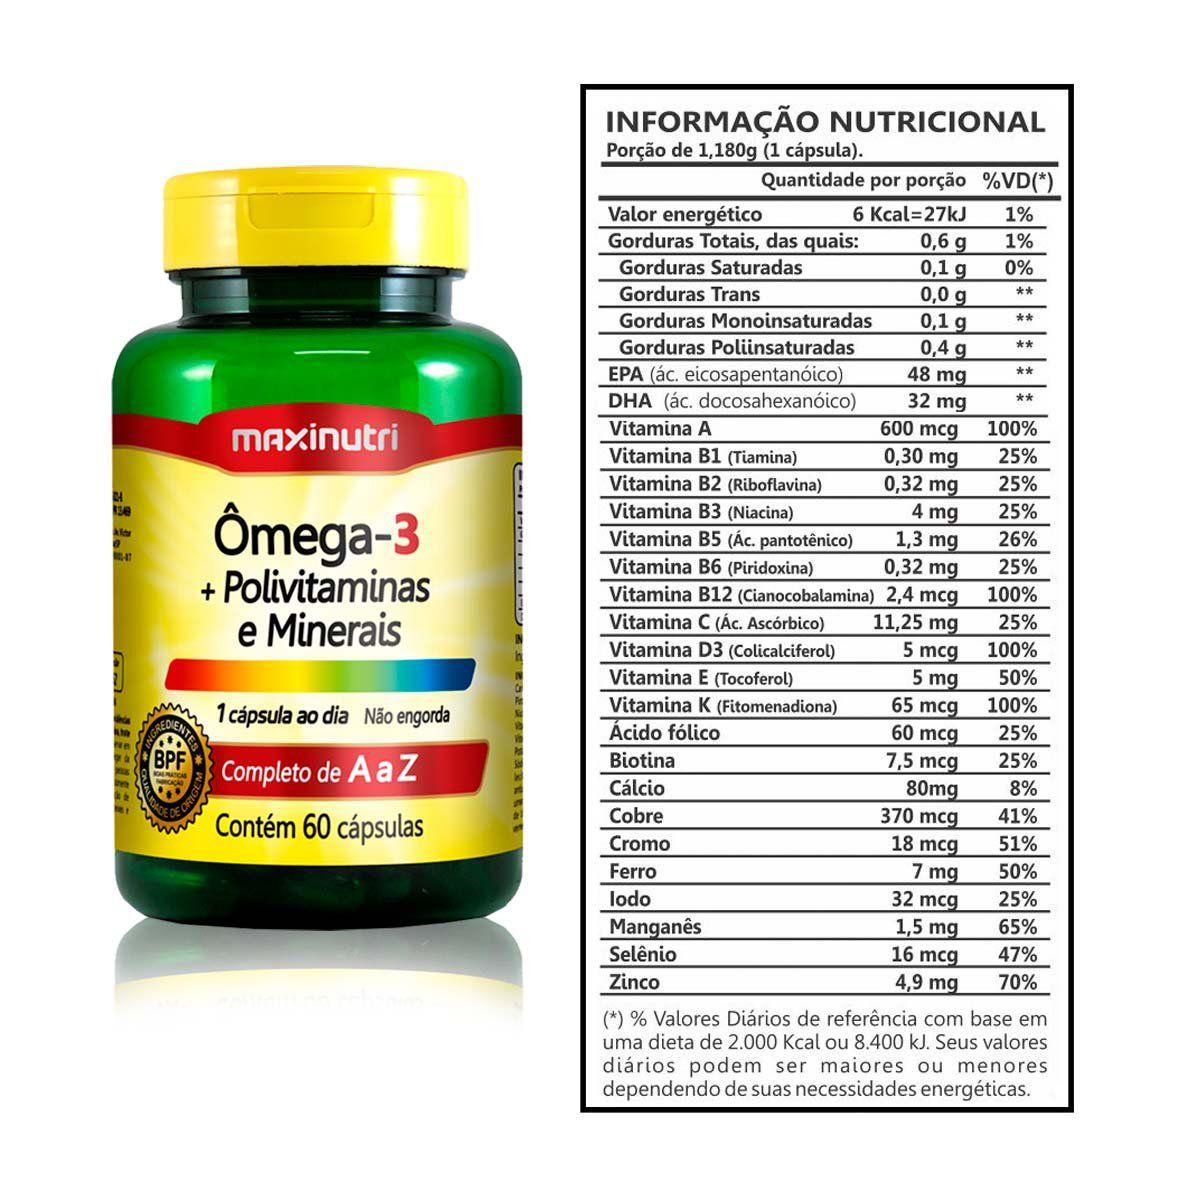 2x Ômega 3 1g + Polivitaminas e Minerais 60 Cápsulas + Porta Cápsulas - Maxinutri